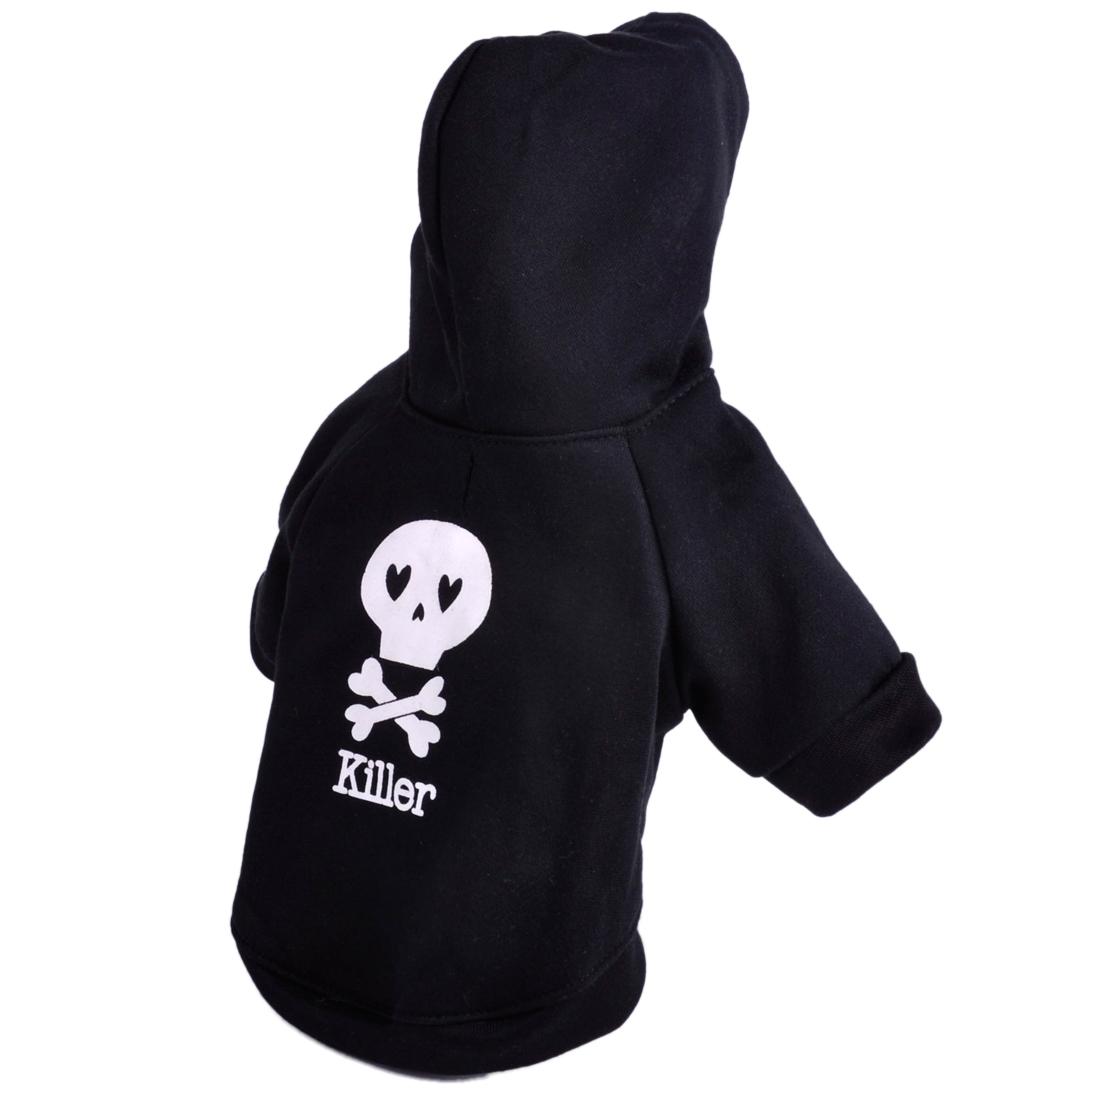 Black Skull Pet Dog Hoodie Clothing Coat Small Puppy Cat